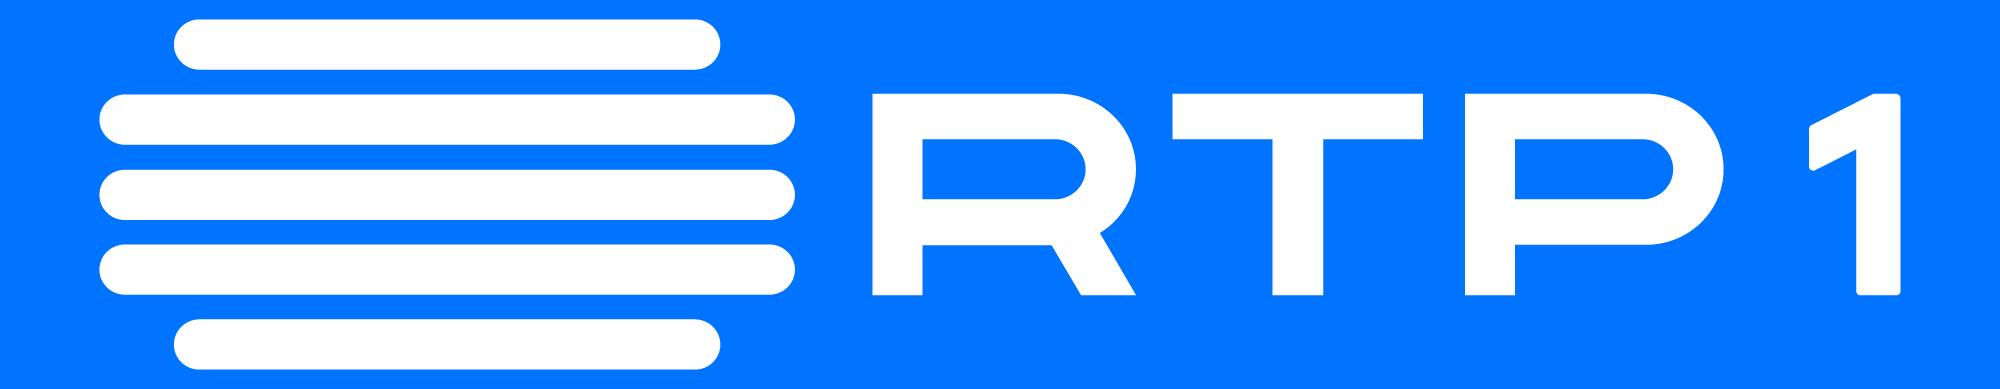 rgb . pdf | ai PlusPng.com  - Rtp Logo PNG